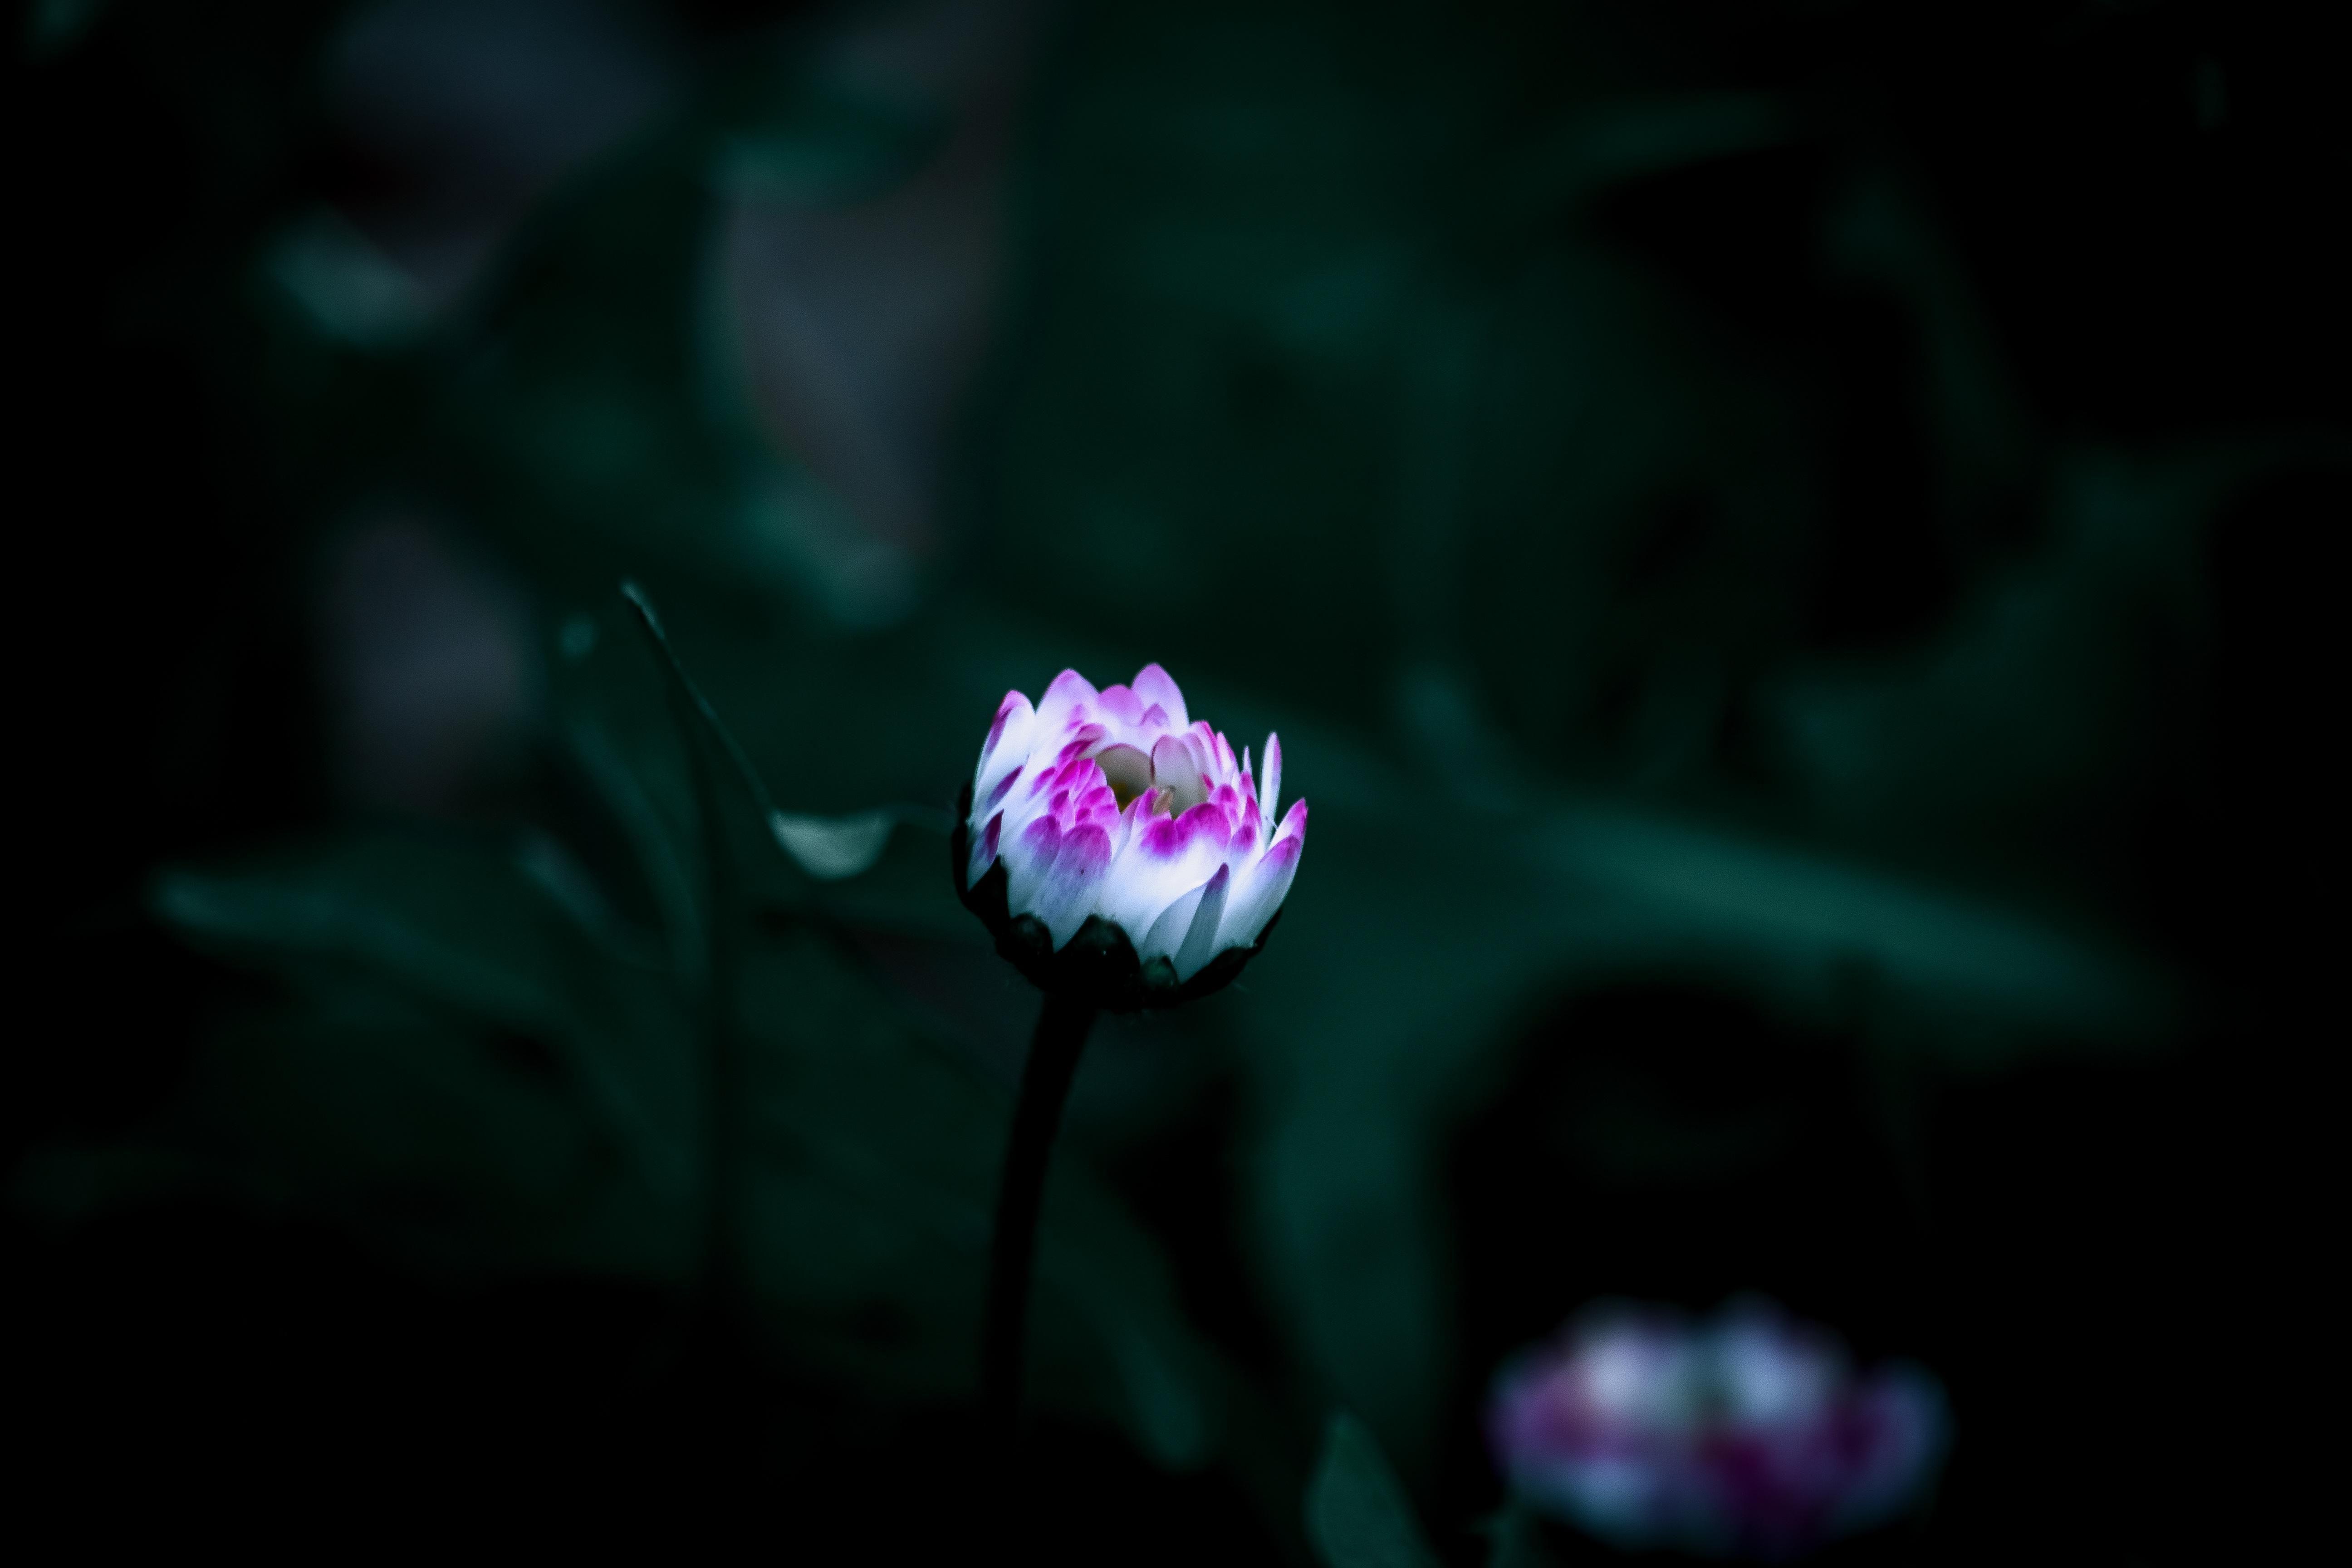 Gambar Bunga Mekar Bergerak